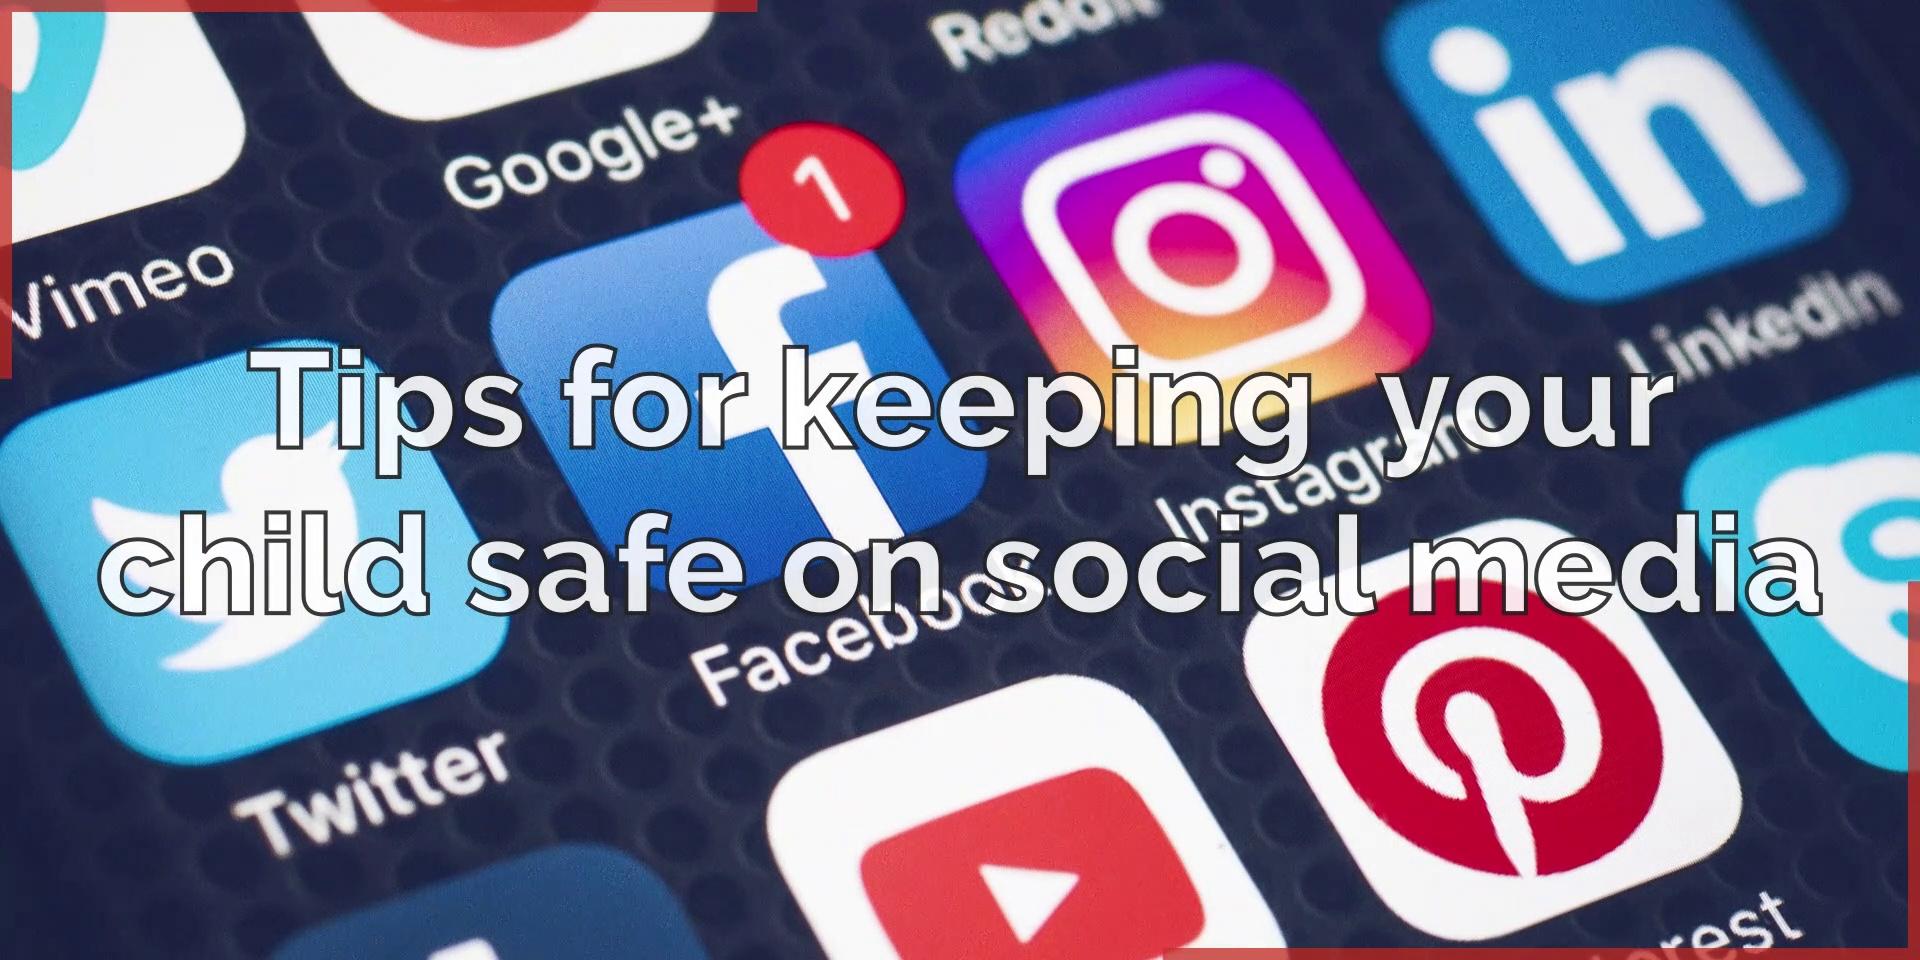 Social media – Tips for keeping your child safe on social media